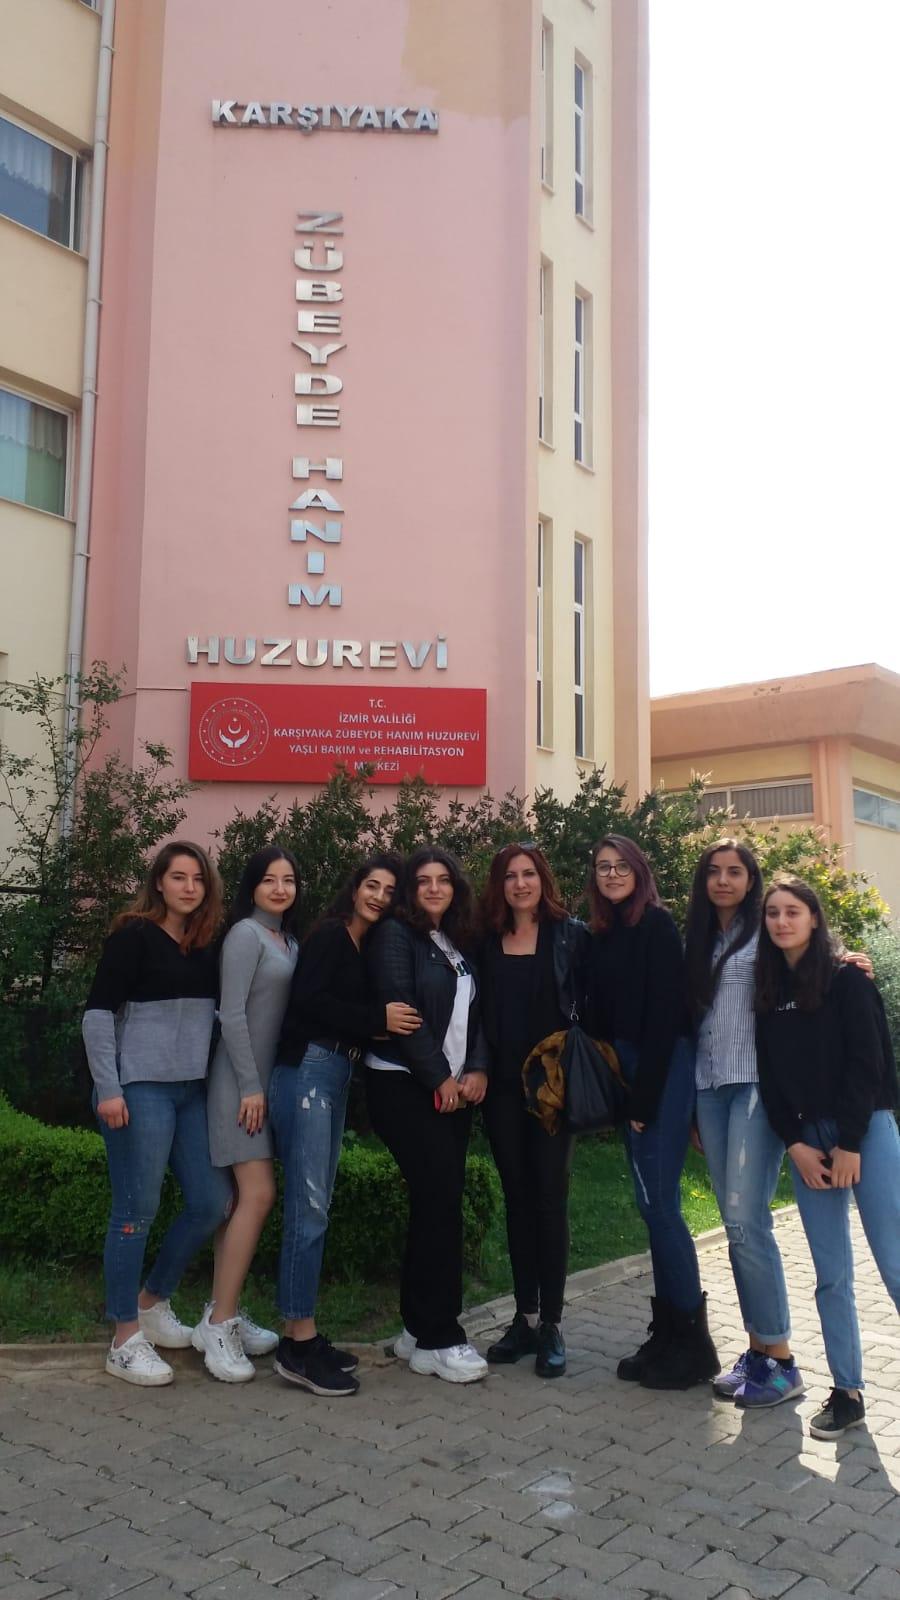 17.04.2018 Huzurevi Gezisi (1)